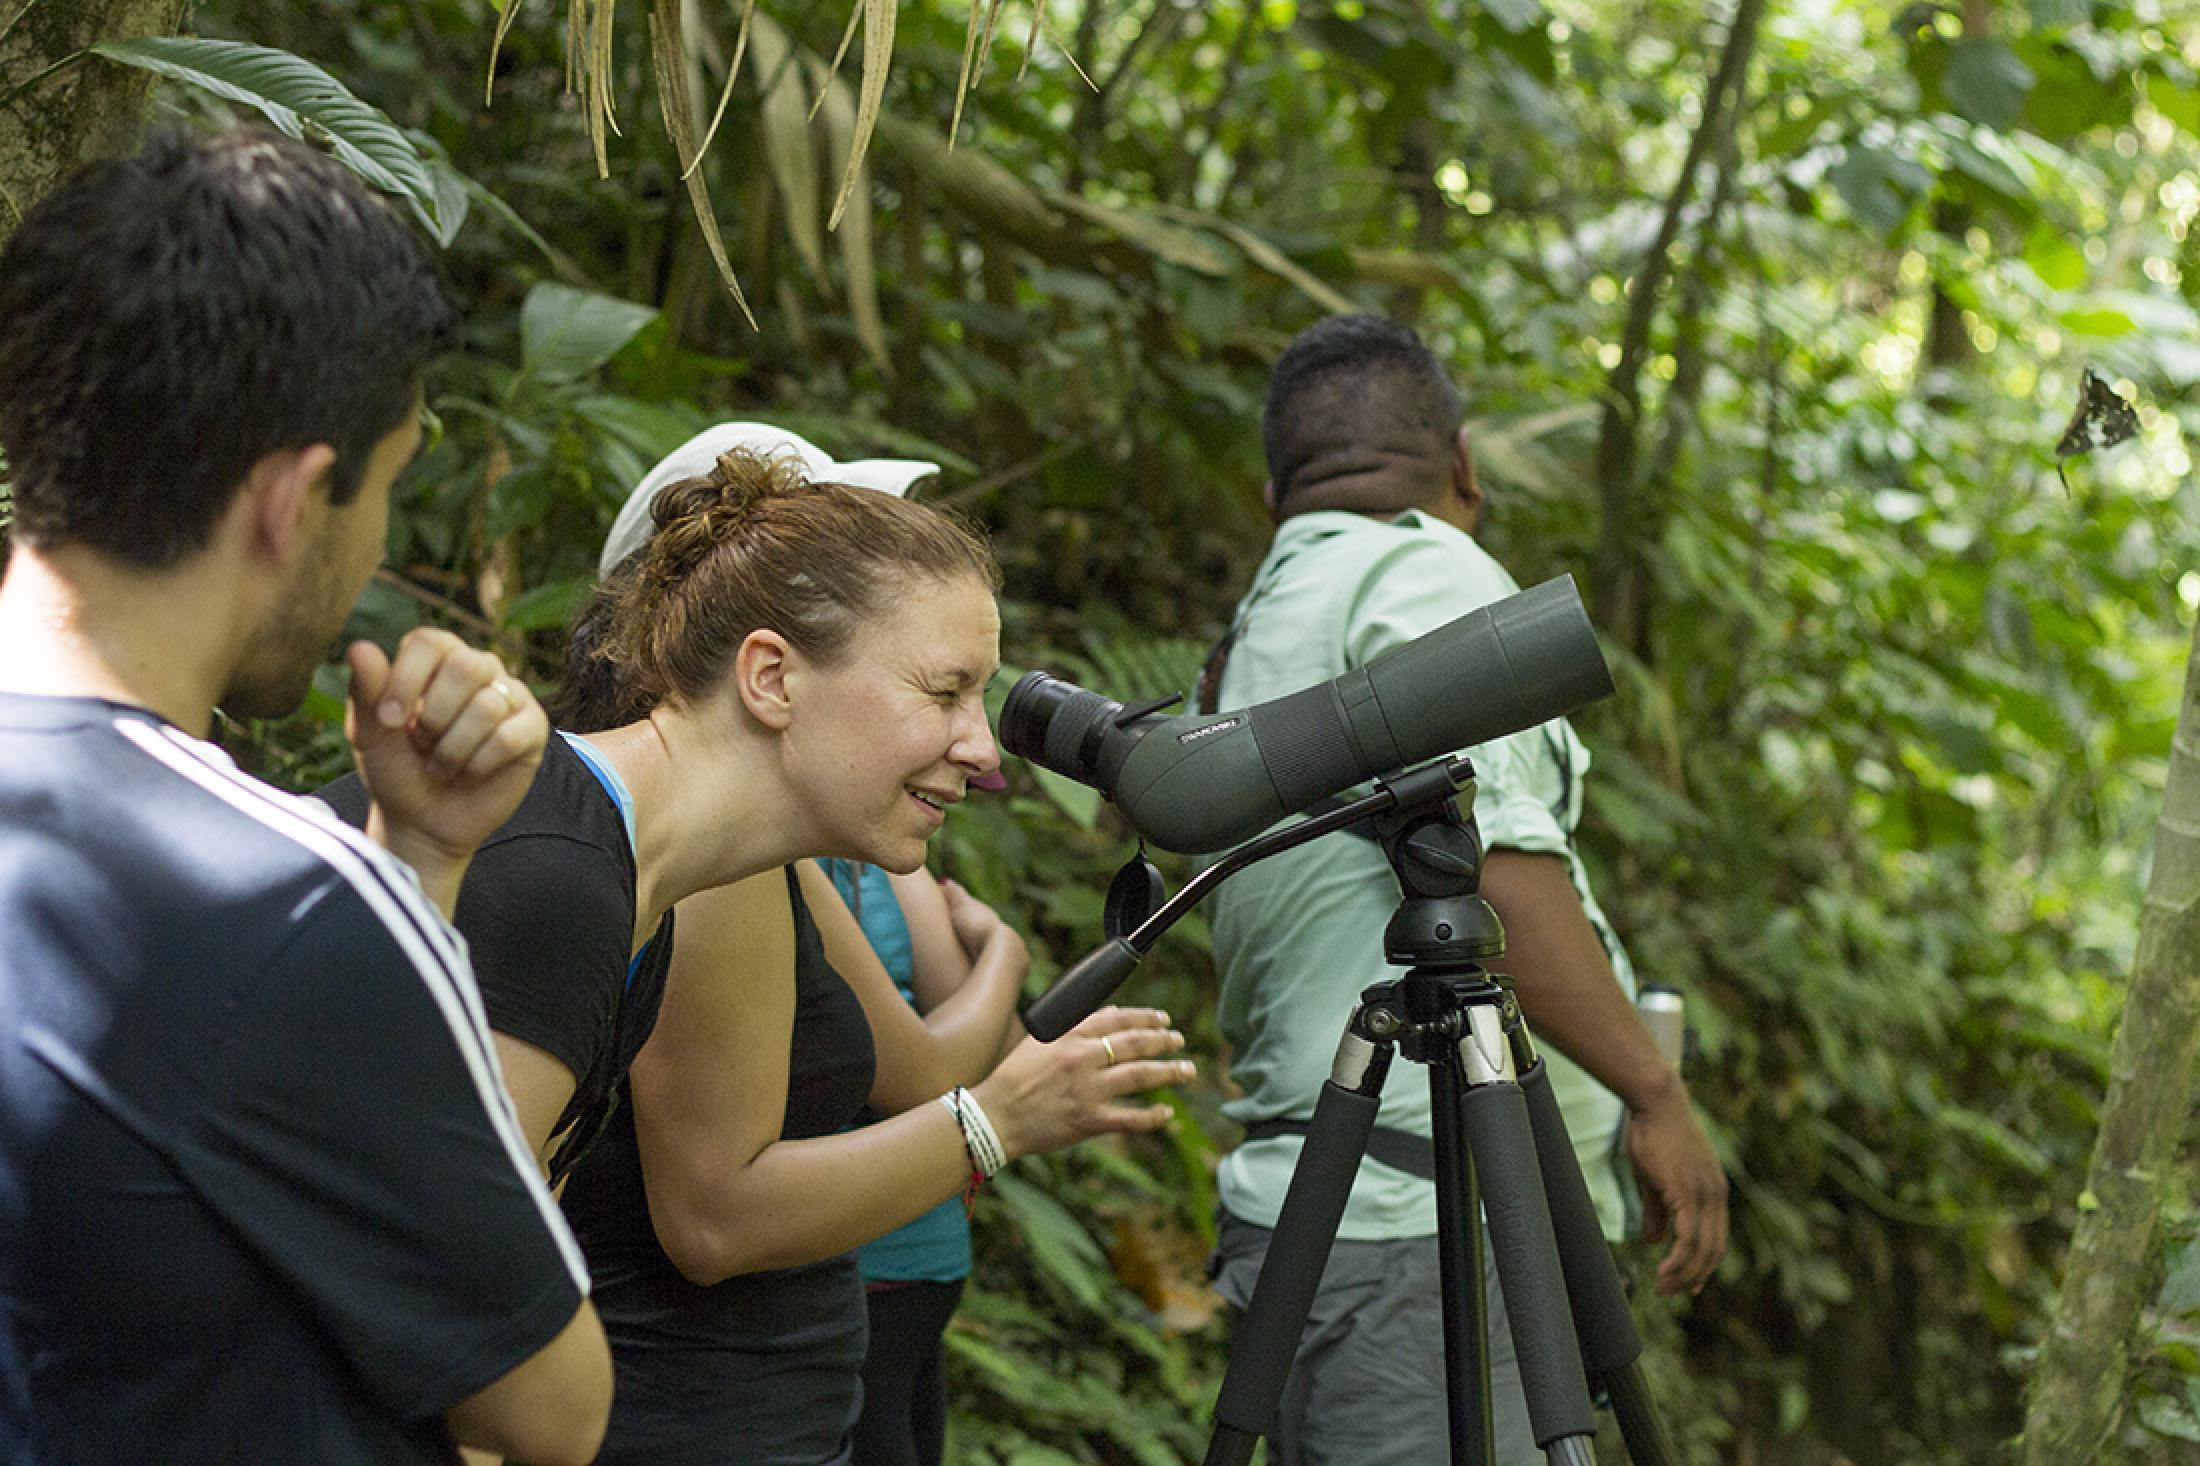 Tour de observación de aves en el bosque lluvioso